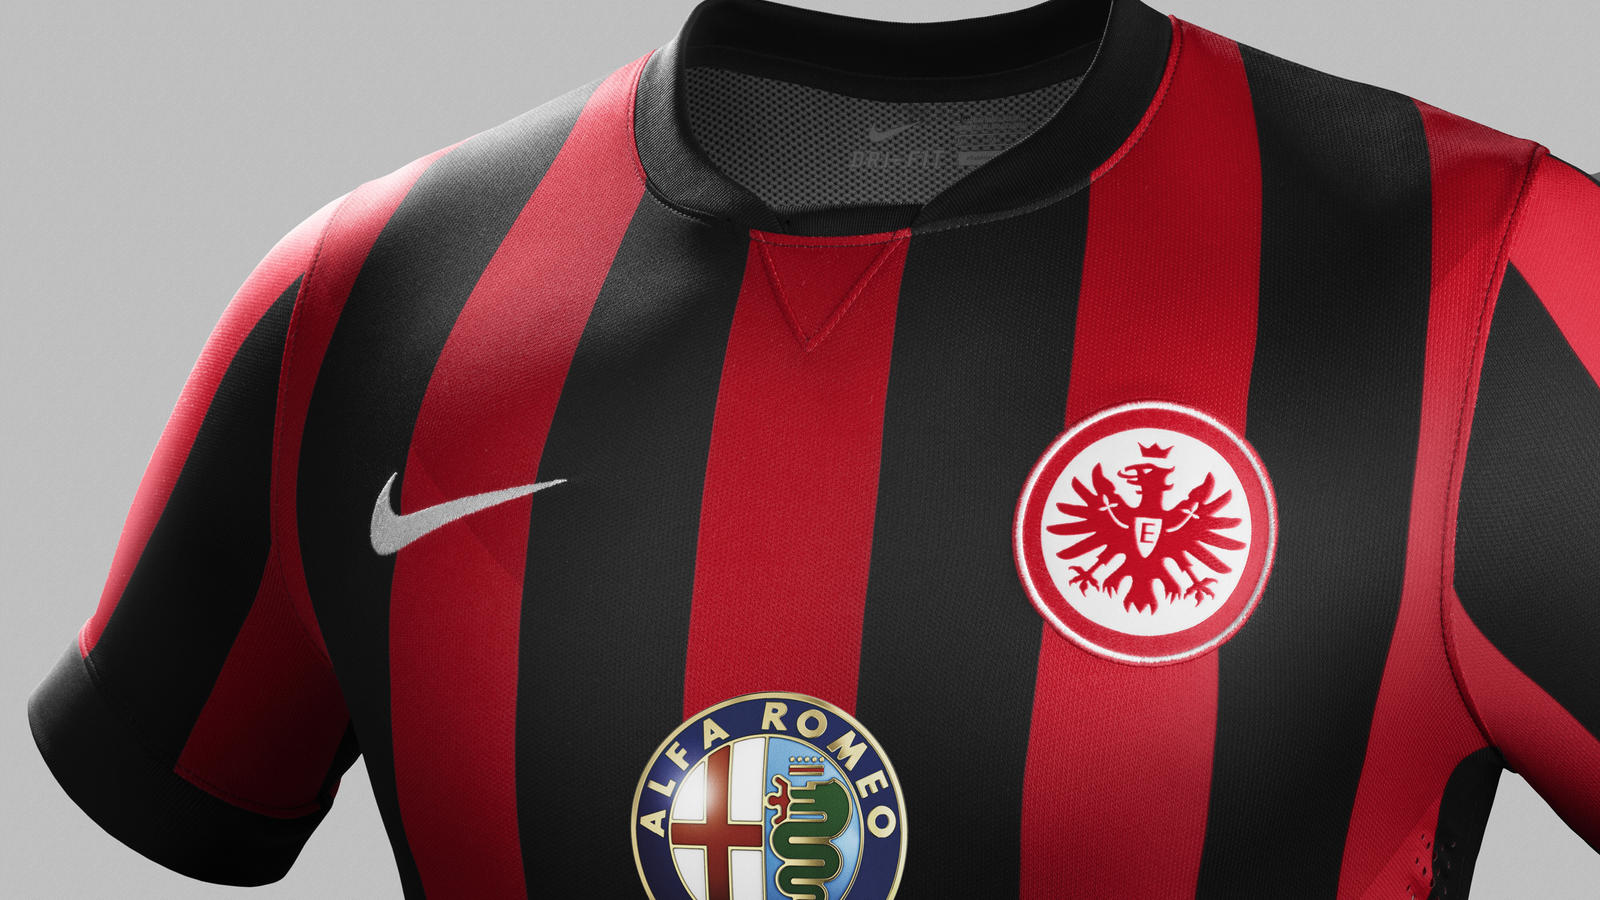 fa14_match_frankfurt_pr_h_crest_r